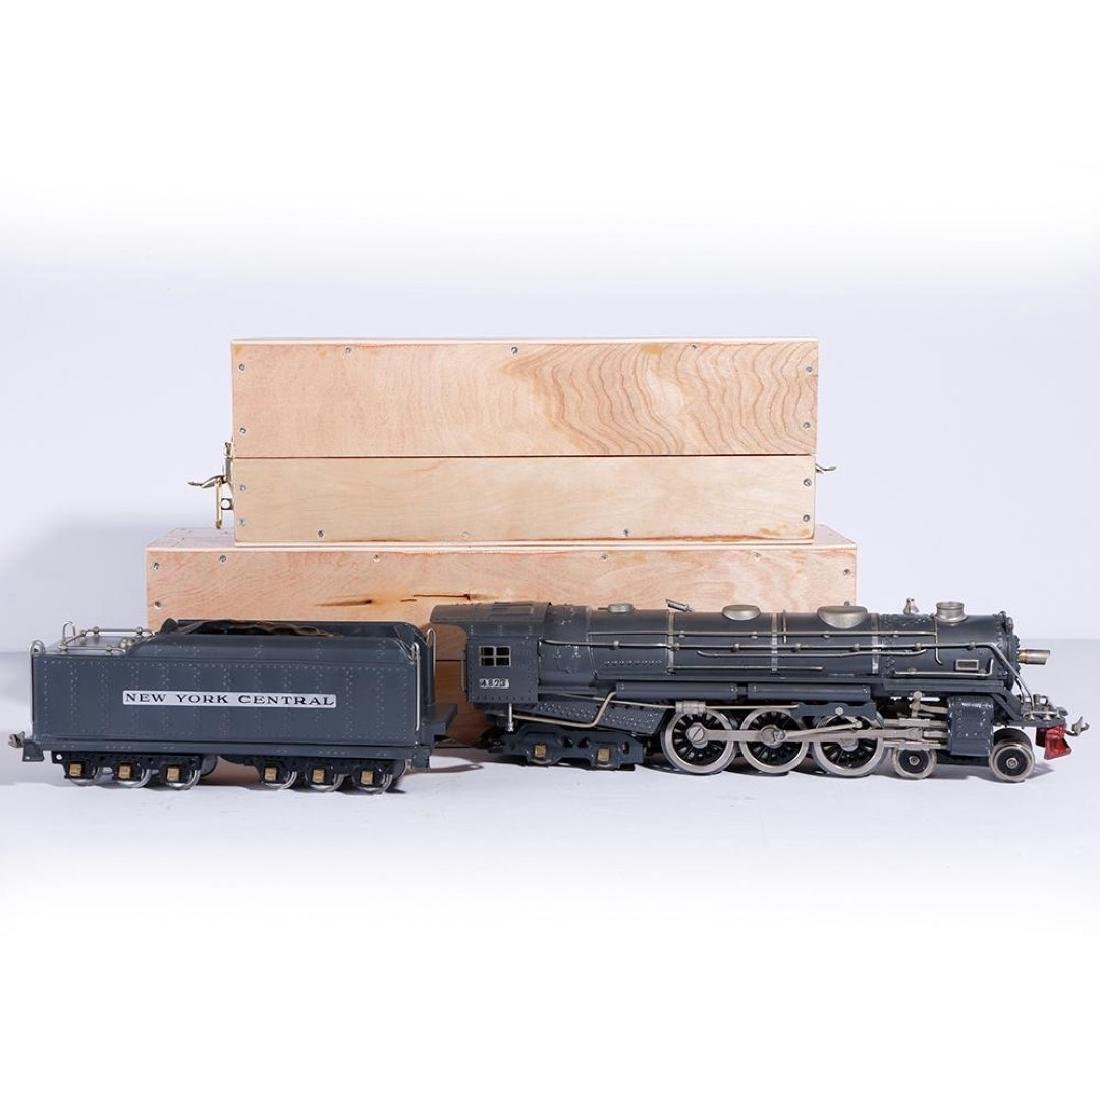 Creswell Standard Gauge 600E Hudson Steam Locomotive